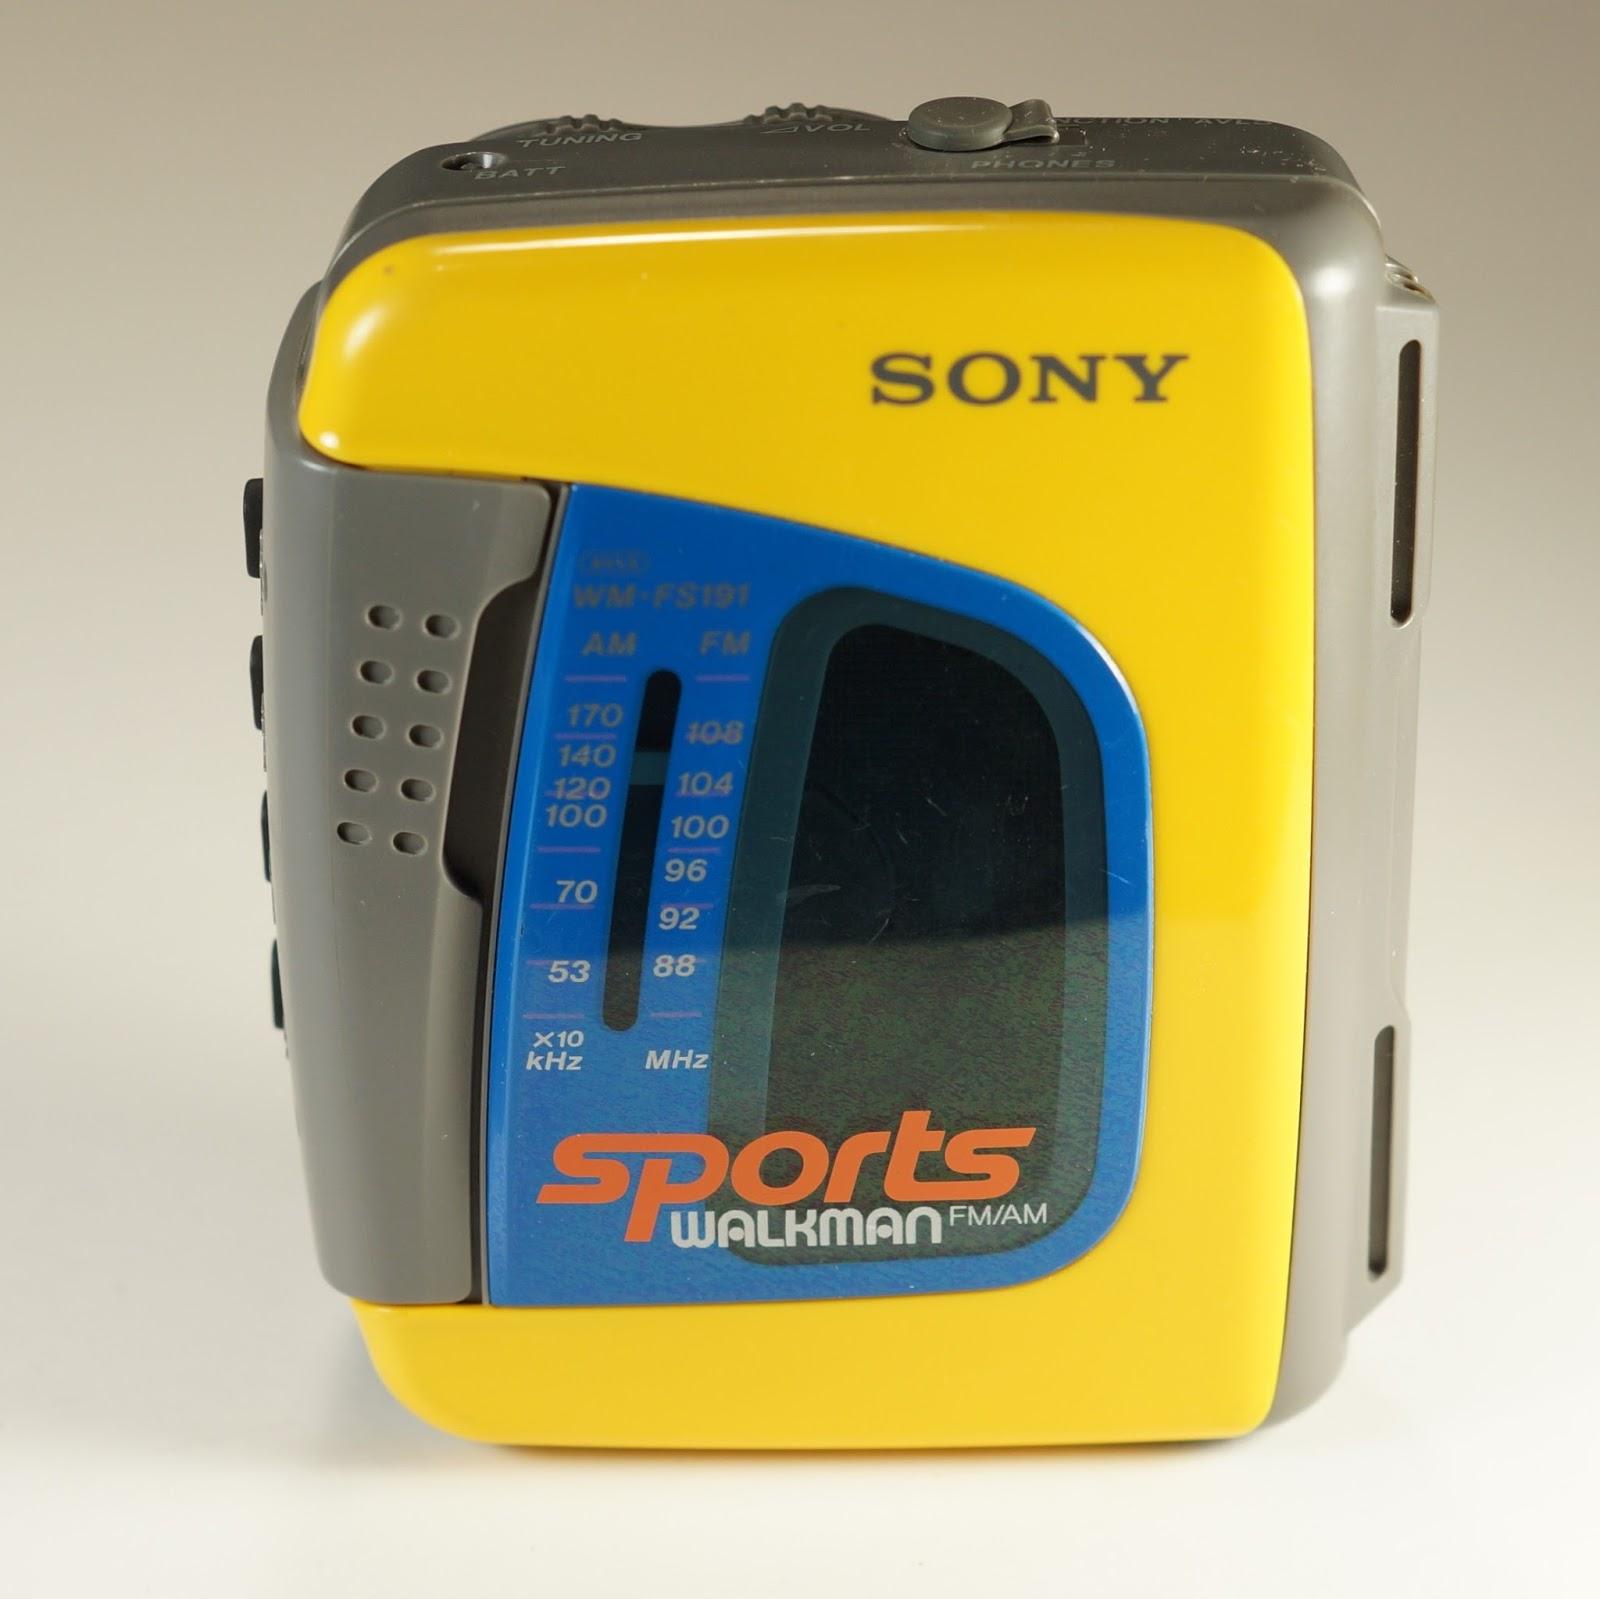 Sony Walkman Wm Fs191 Yellow Sports Portable Cassette